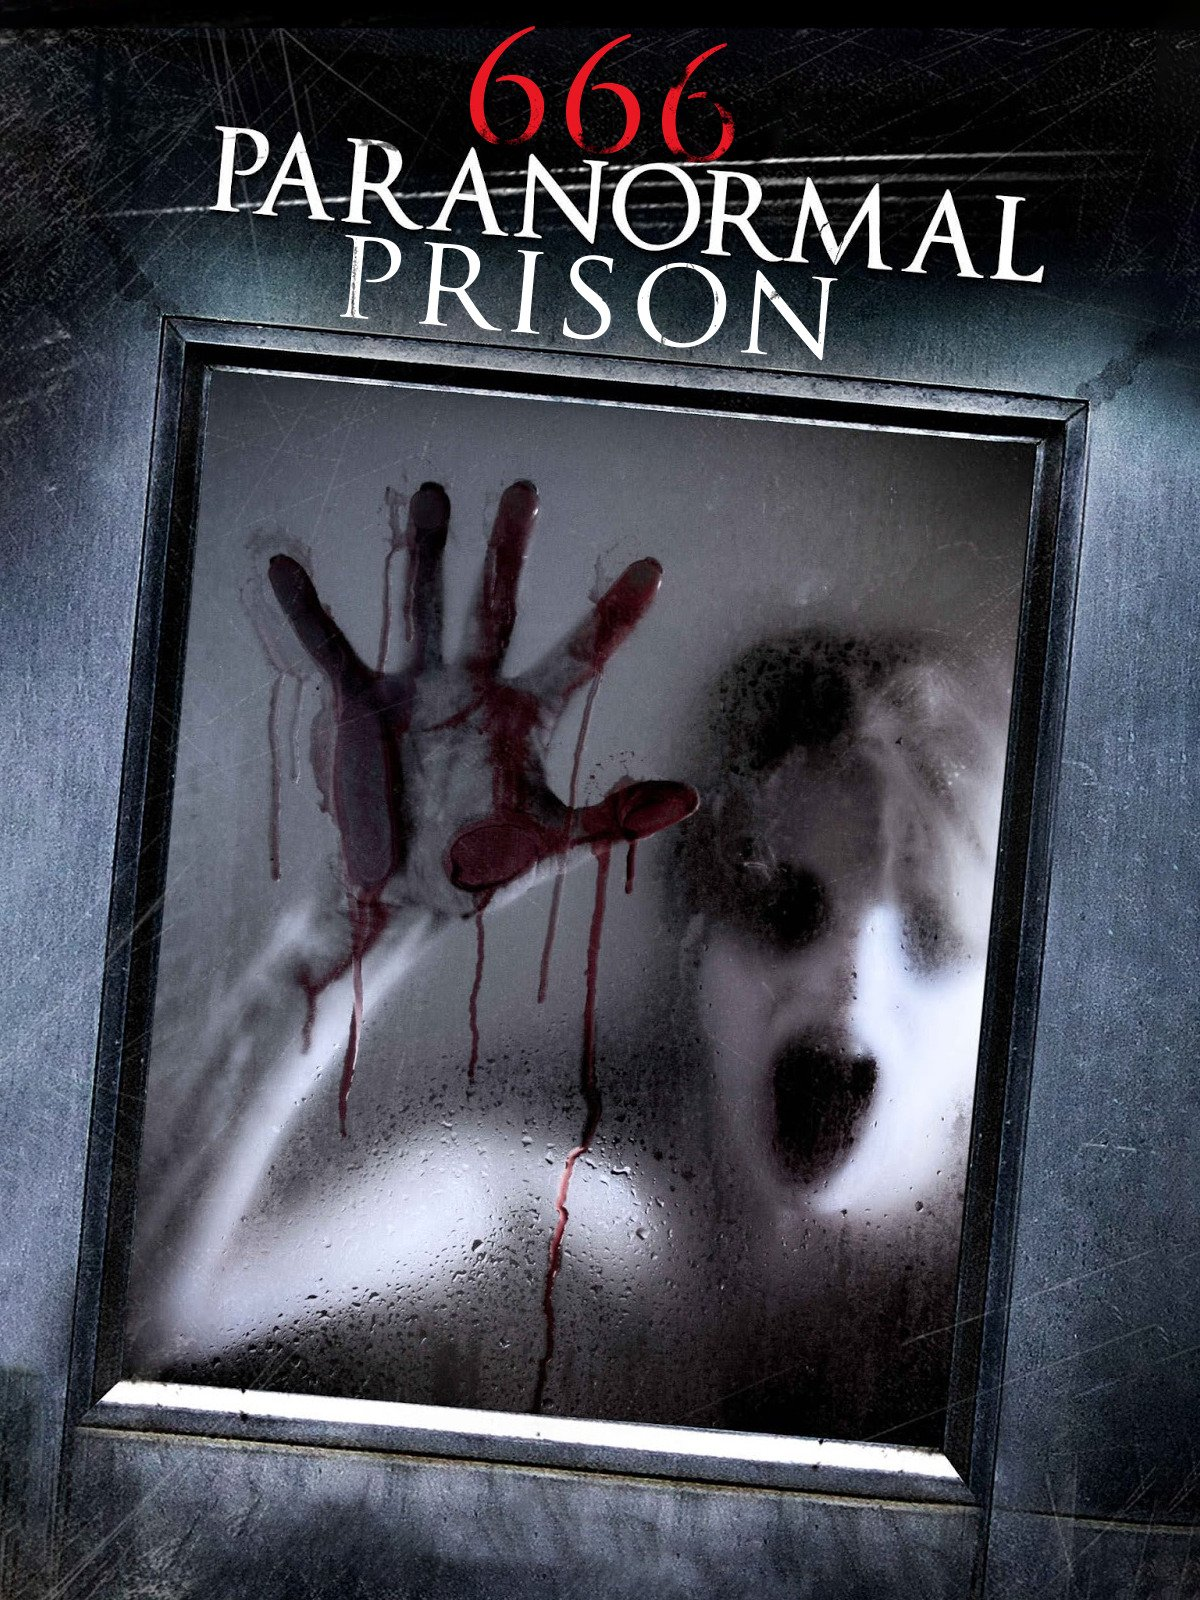 Amazon.de 20   Paranormal Prison ansehen   Prime Video